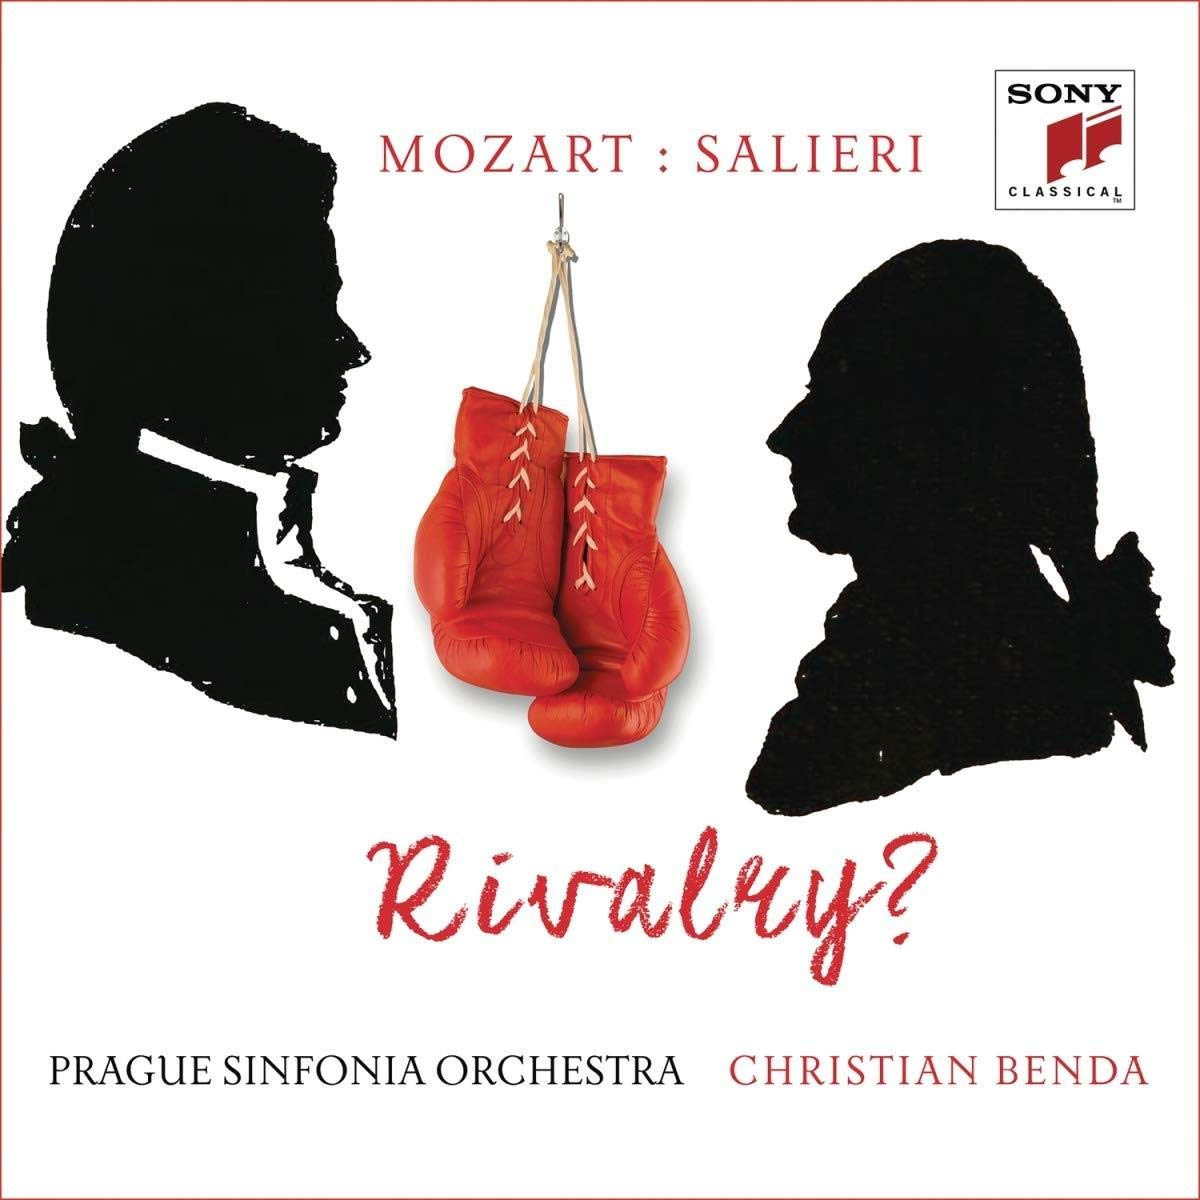 Mozart Versus Salieri: Rivalry? - Prague Sinfonia Orchestra, Christian  Benda, Wolfgang Amadeus Mozart, Antonio Salieri, Christian Benda:  Amazon.de: Musik